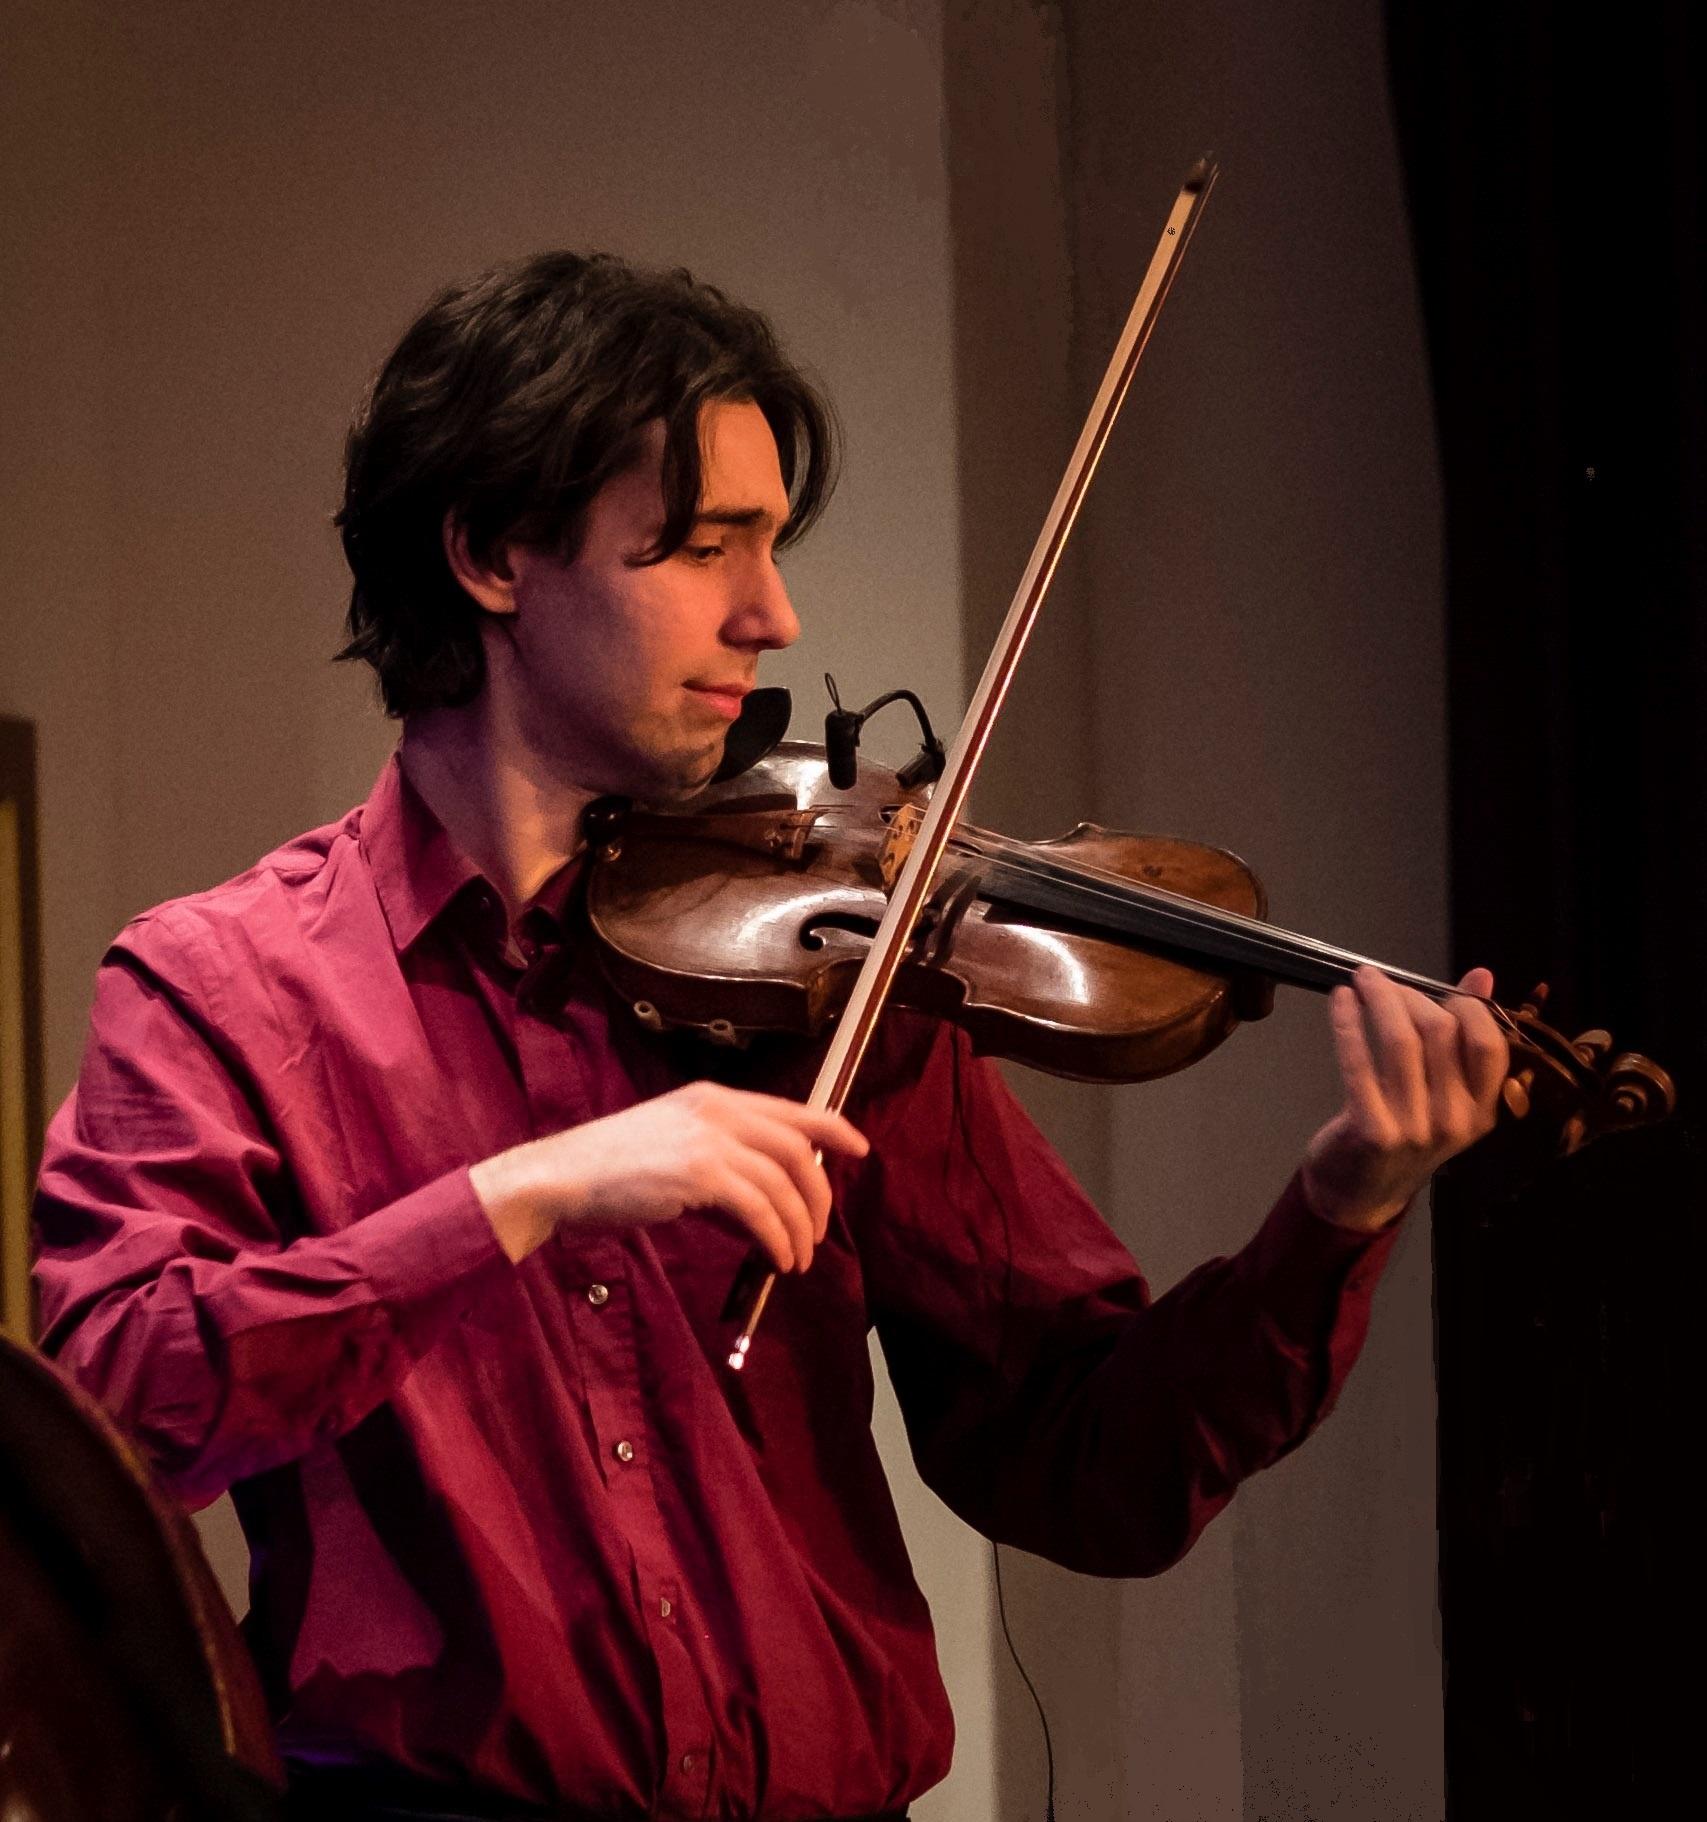 Tangopianissimo - Amadeo Espina